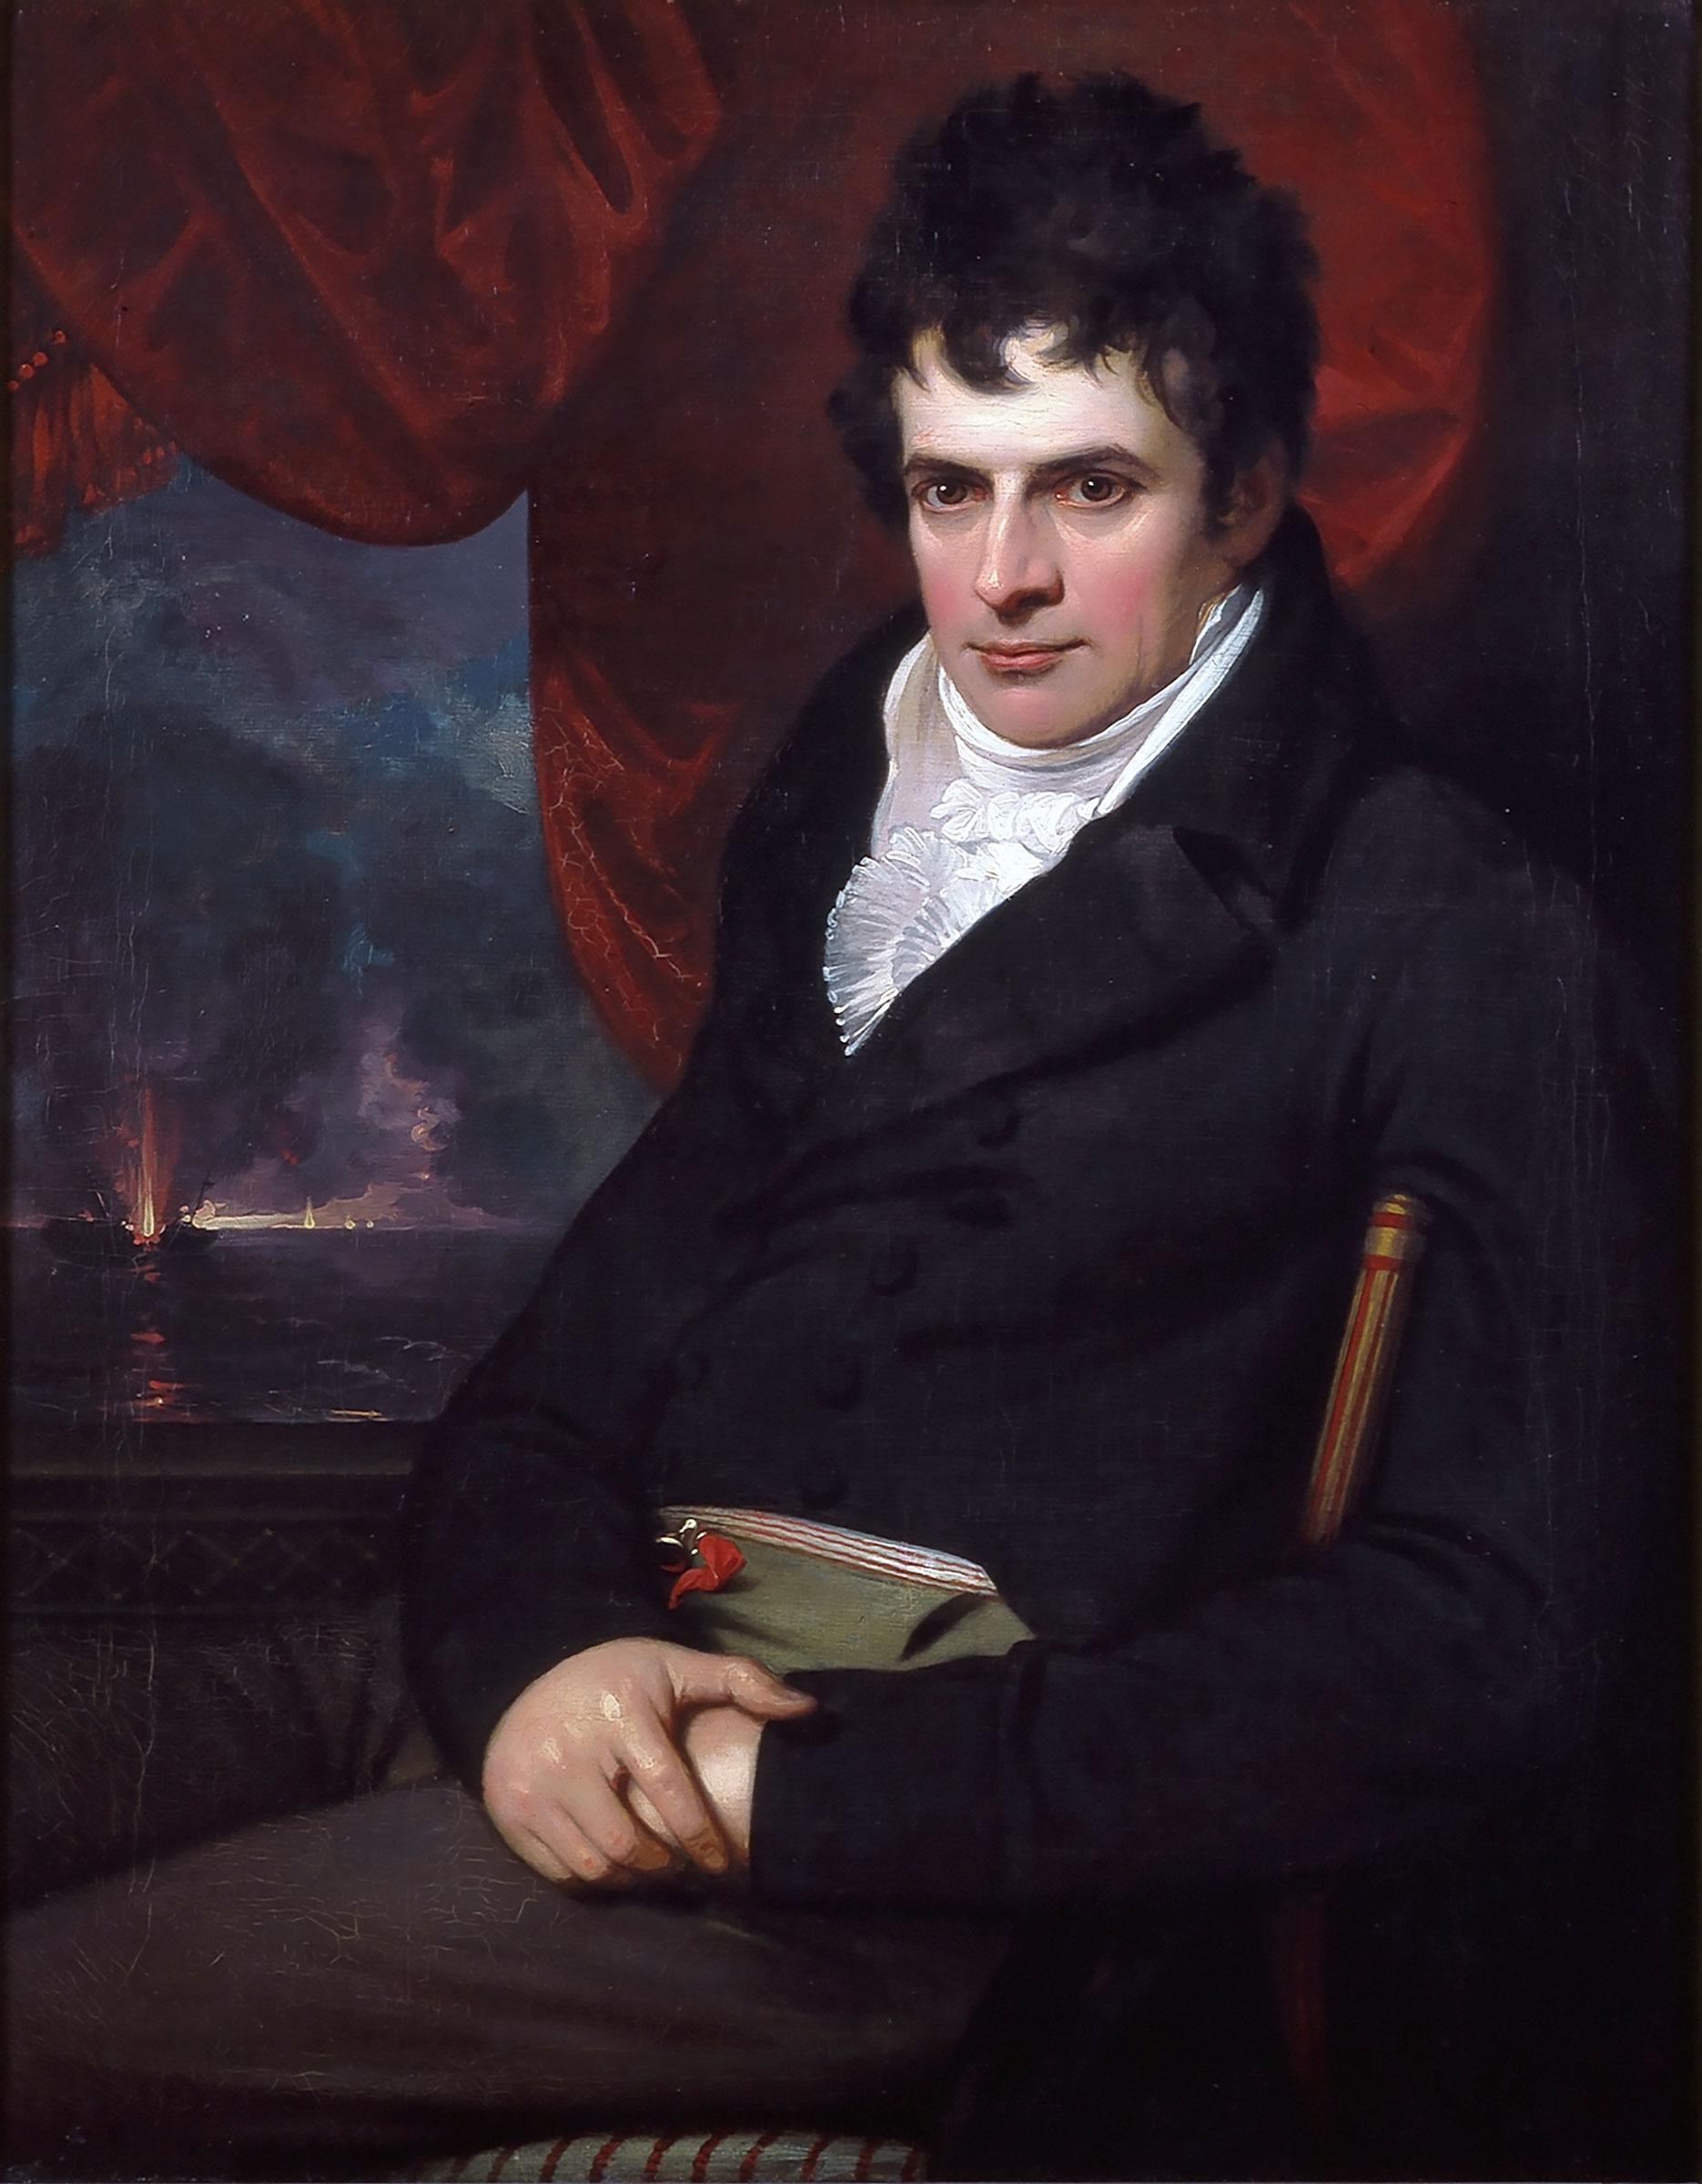 Benjamin West, American, 1738-1820, Robert Fulton, 1806, London, England.